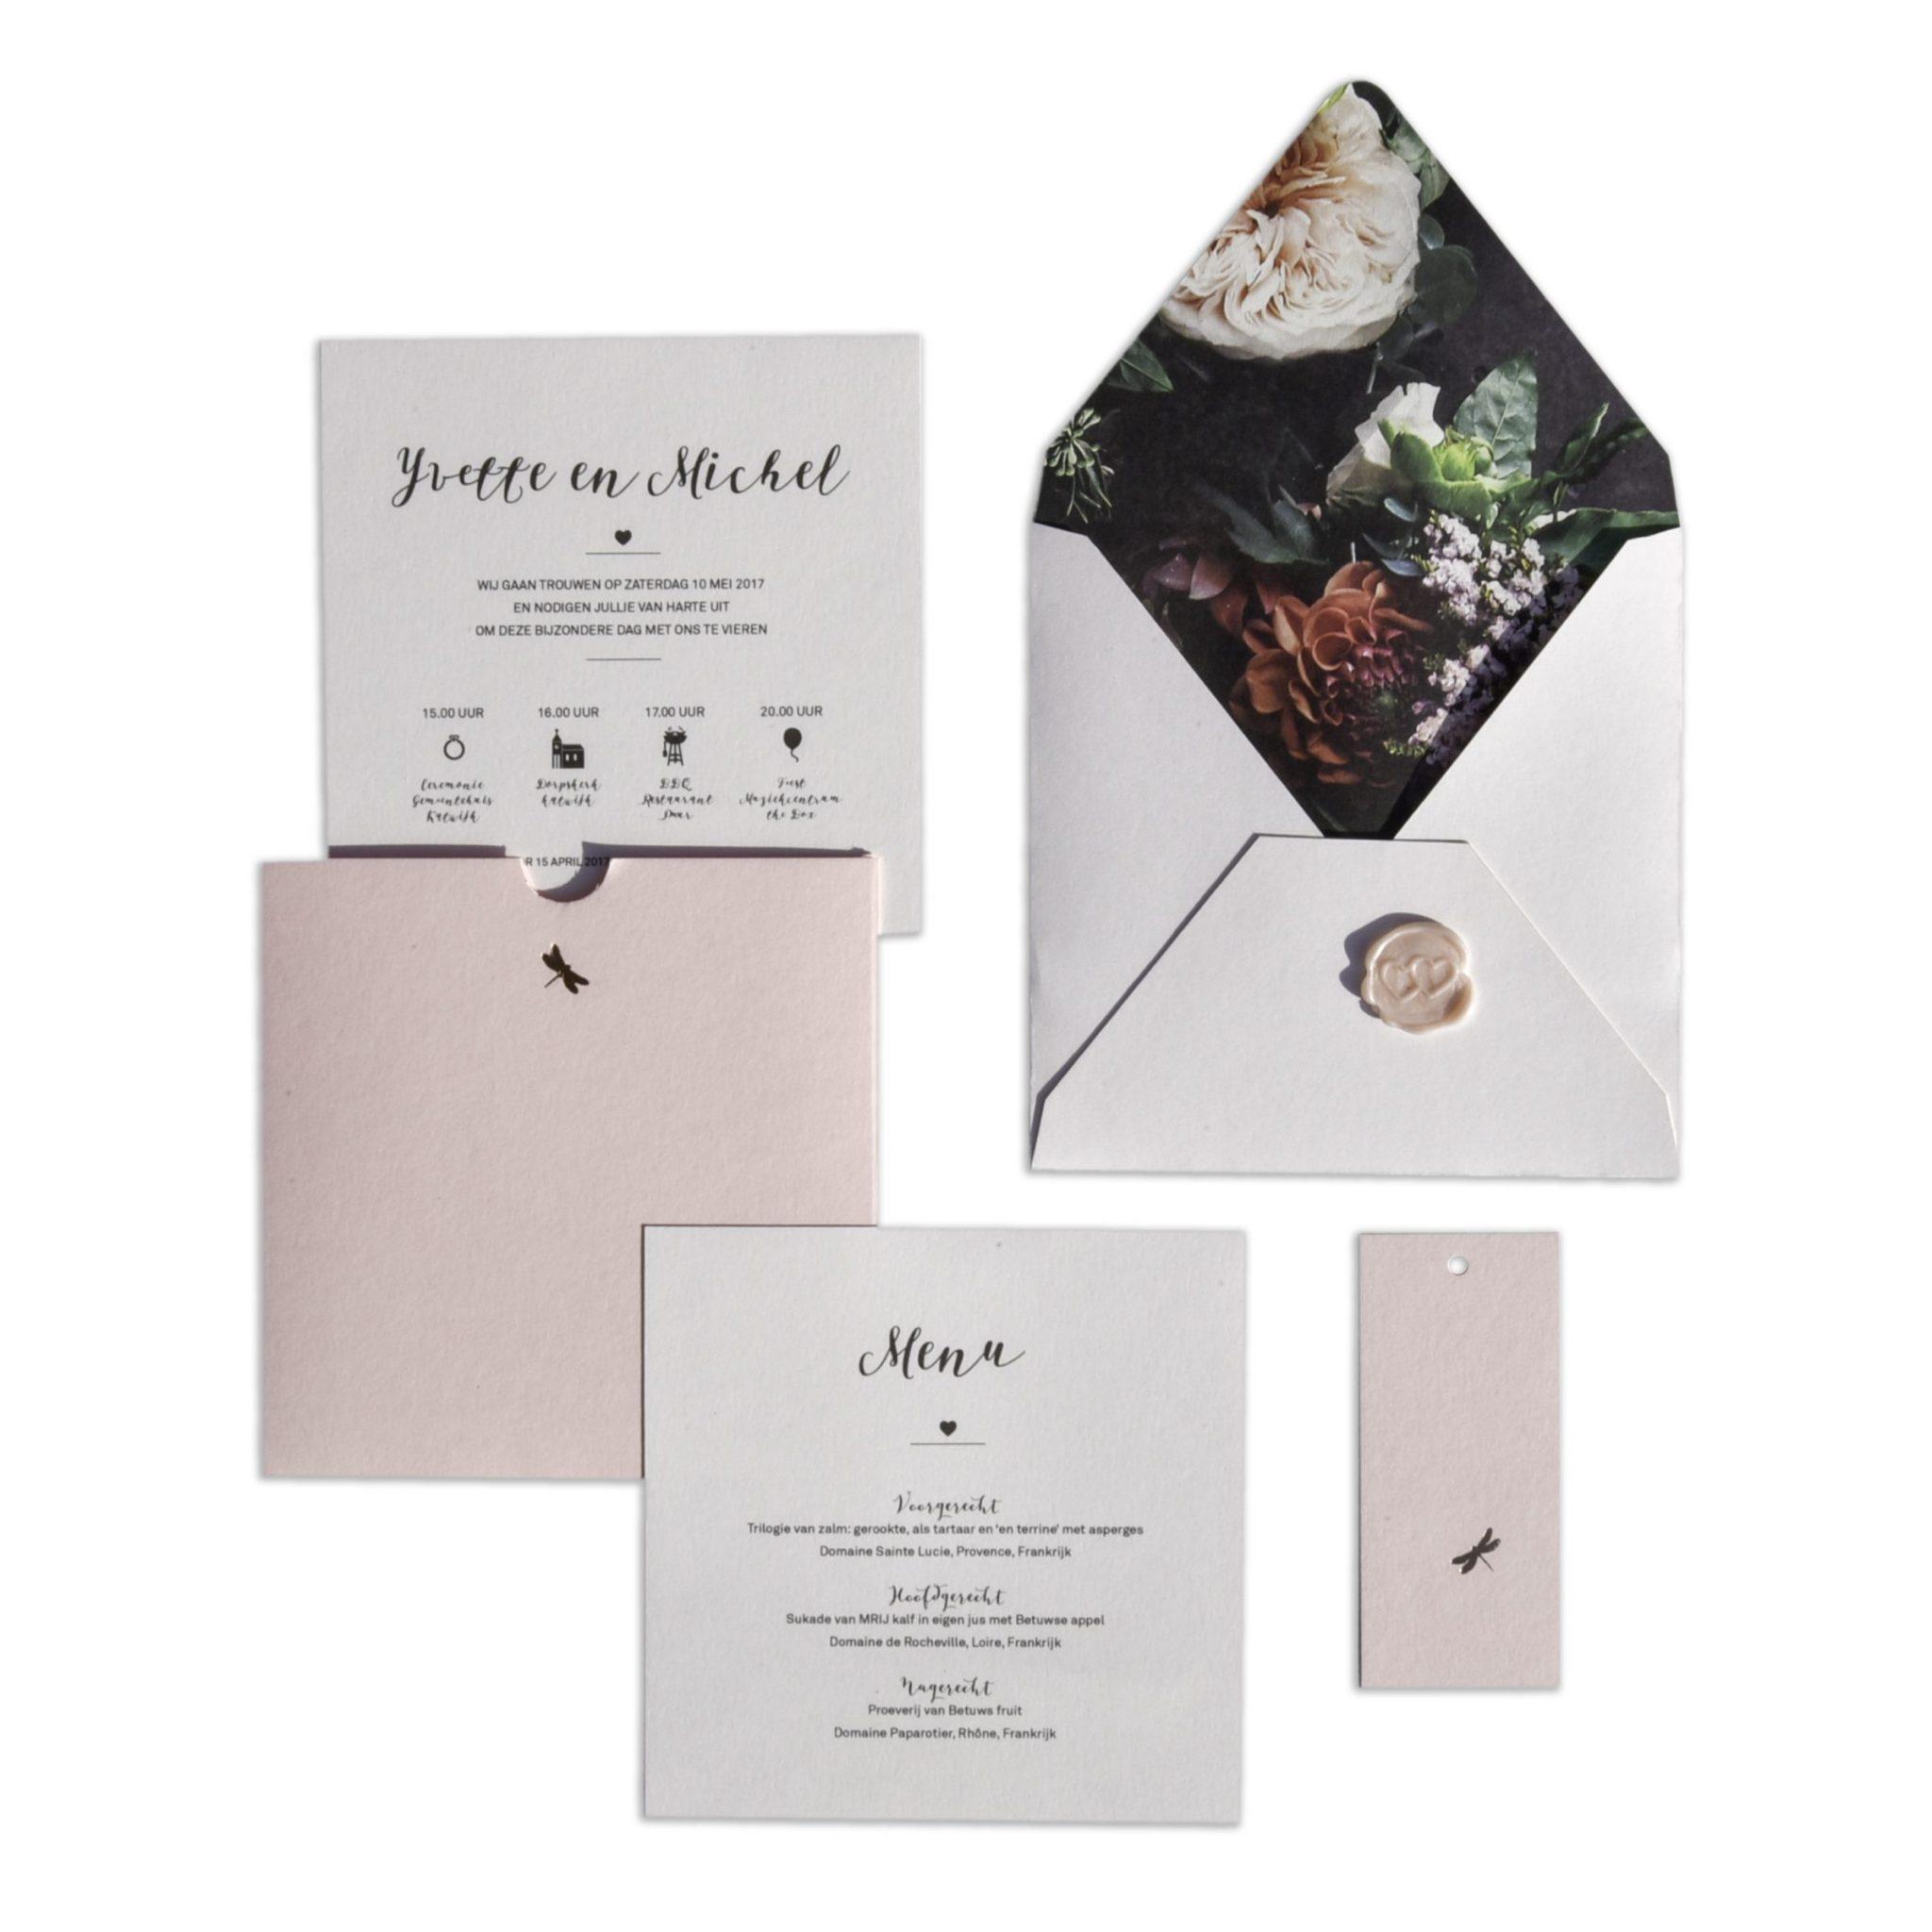 yvette_michel trouwkaart wedding invitation